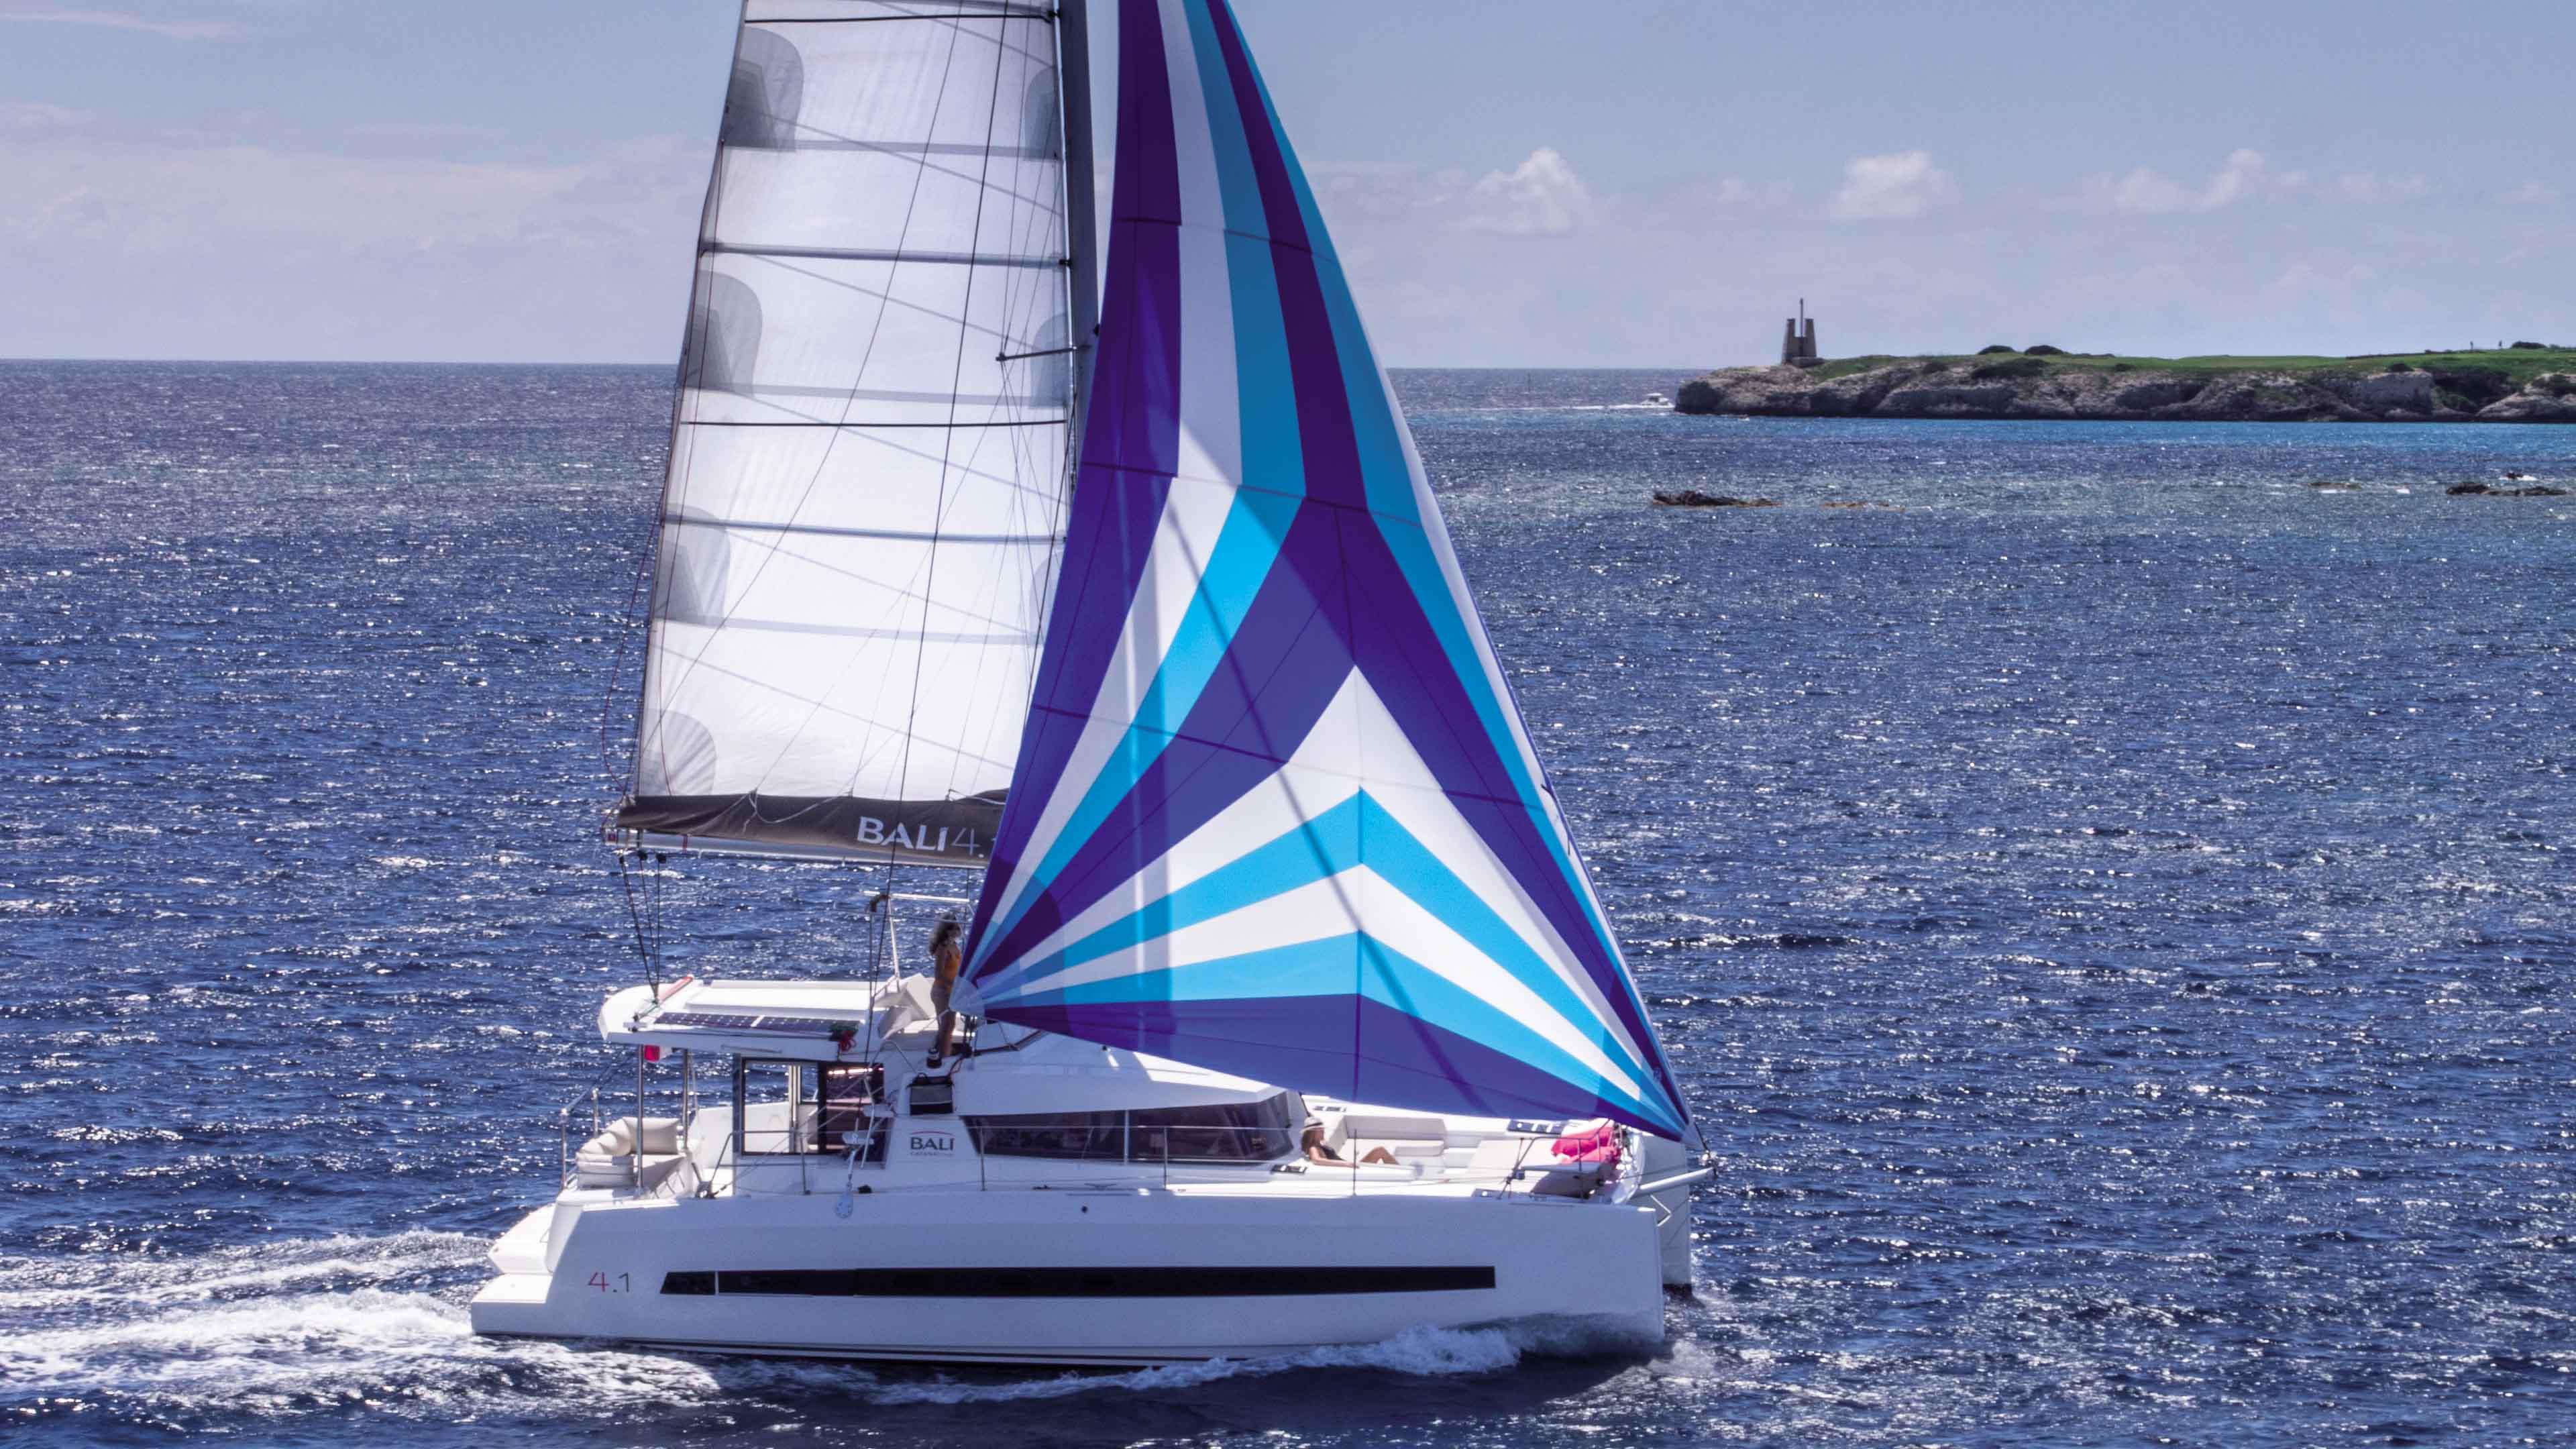 Bali 4.1 Privilege - Catamaran for Charter in Greece